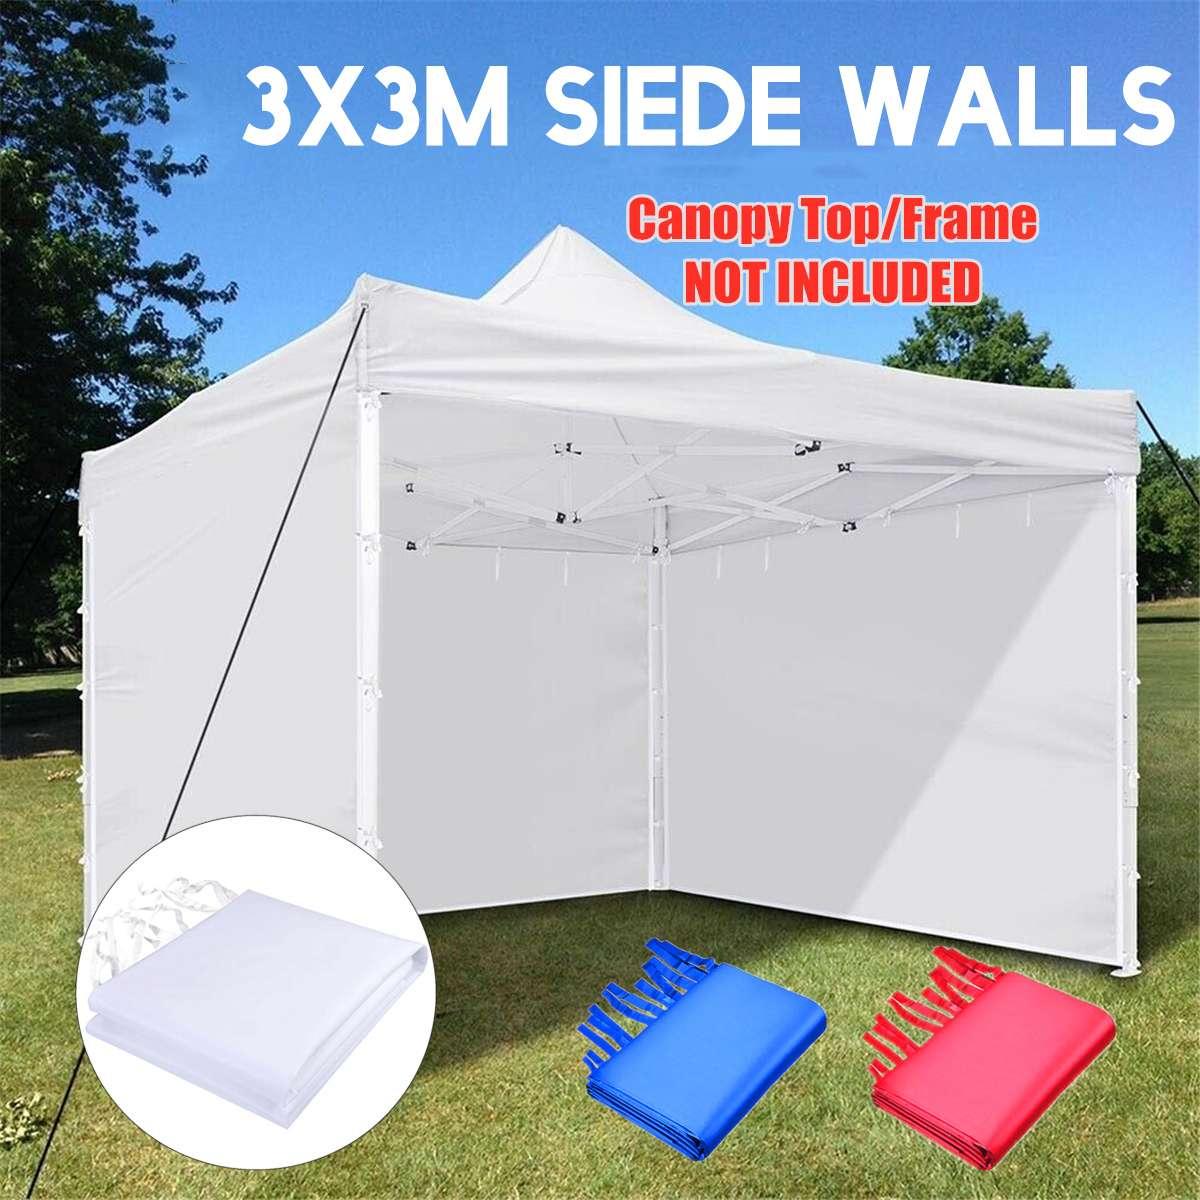 3x3m Oxford Cloth Party Tent Single Sidewall Waterproof Garden Patio Outdoor Canopy Sun Wall Sunshade Tarp Sidewall Sunshade Red